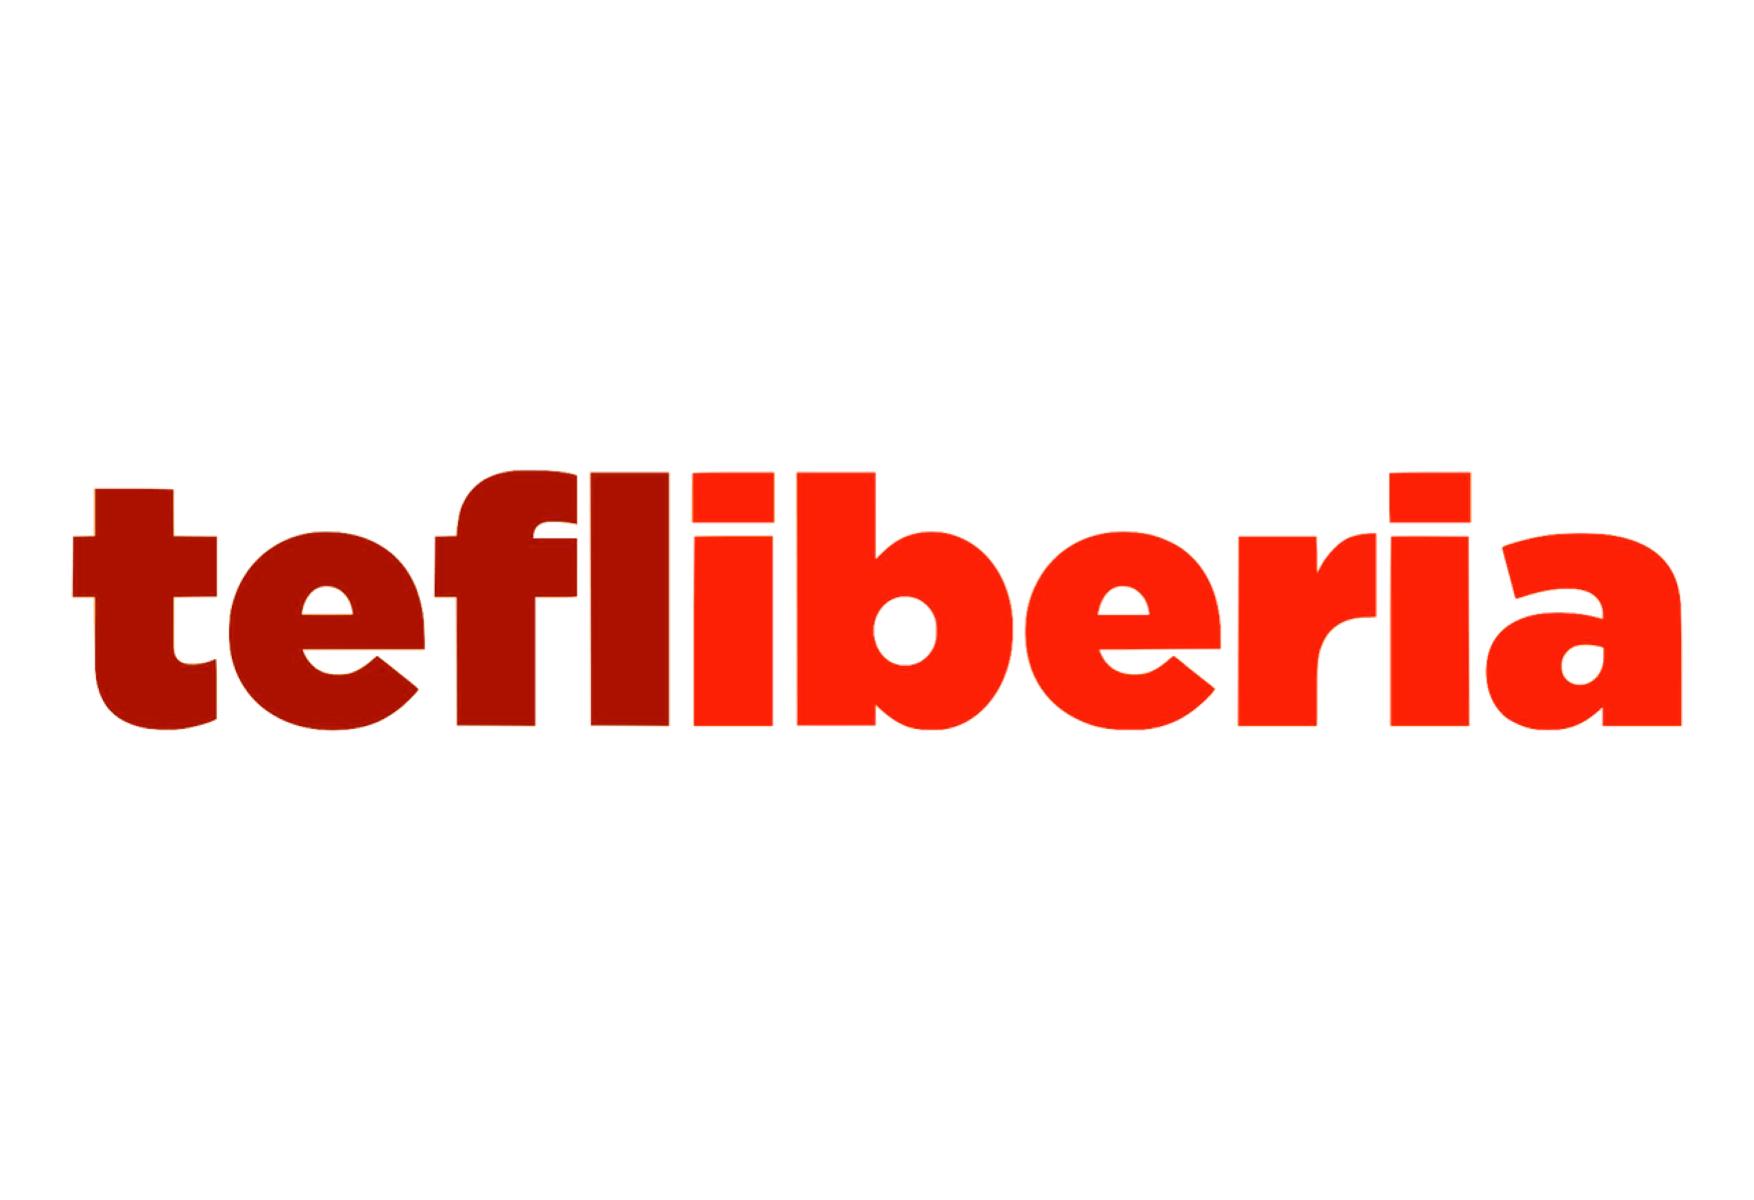 tefl-iberia-tefl-tesol-reviews-logo